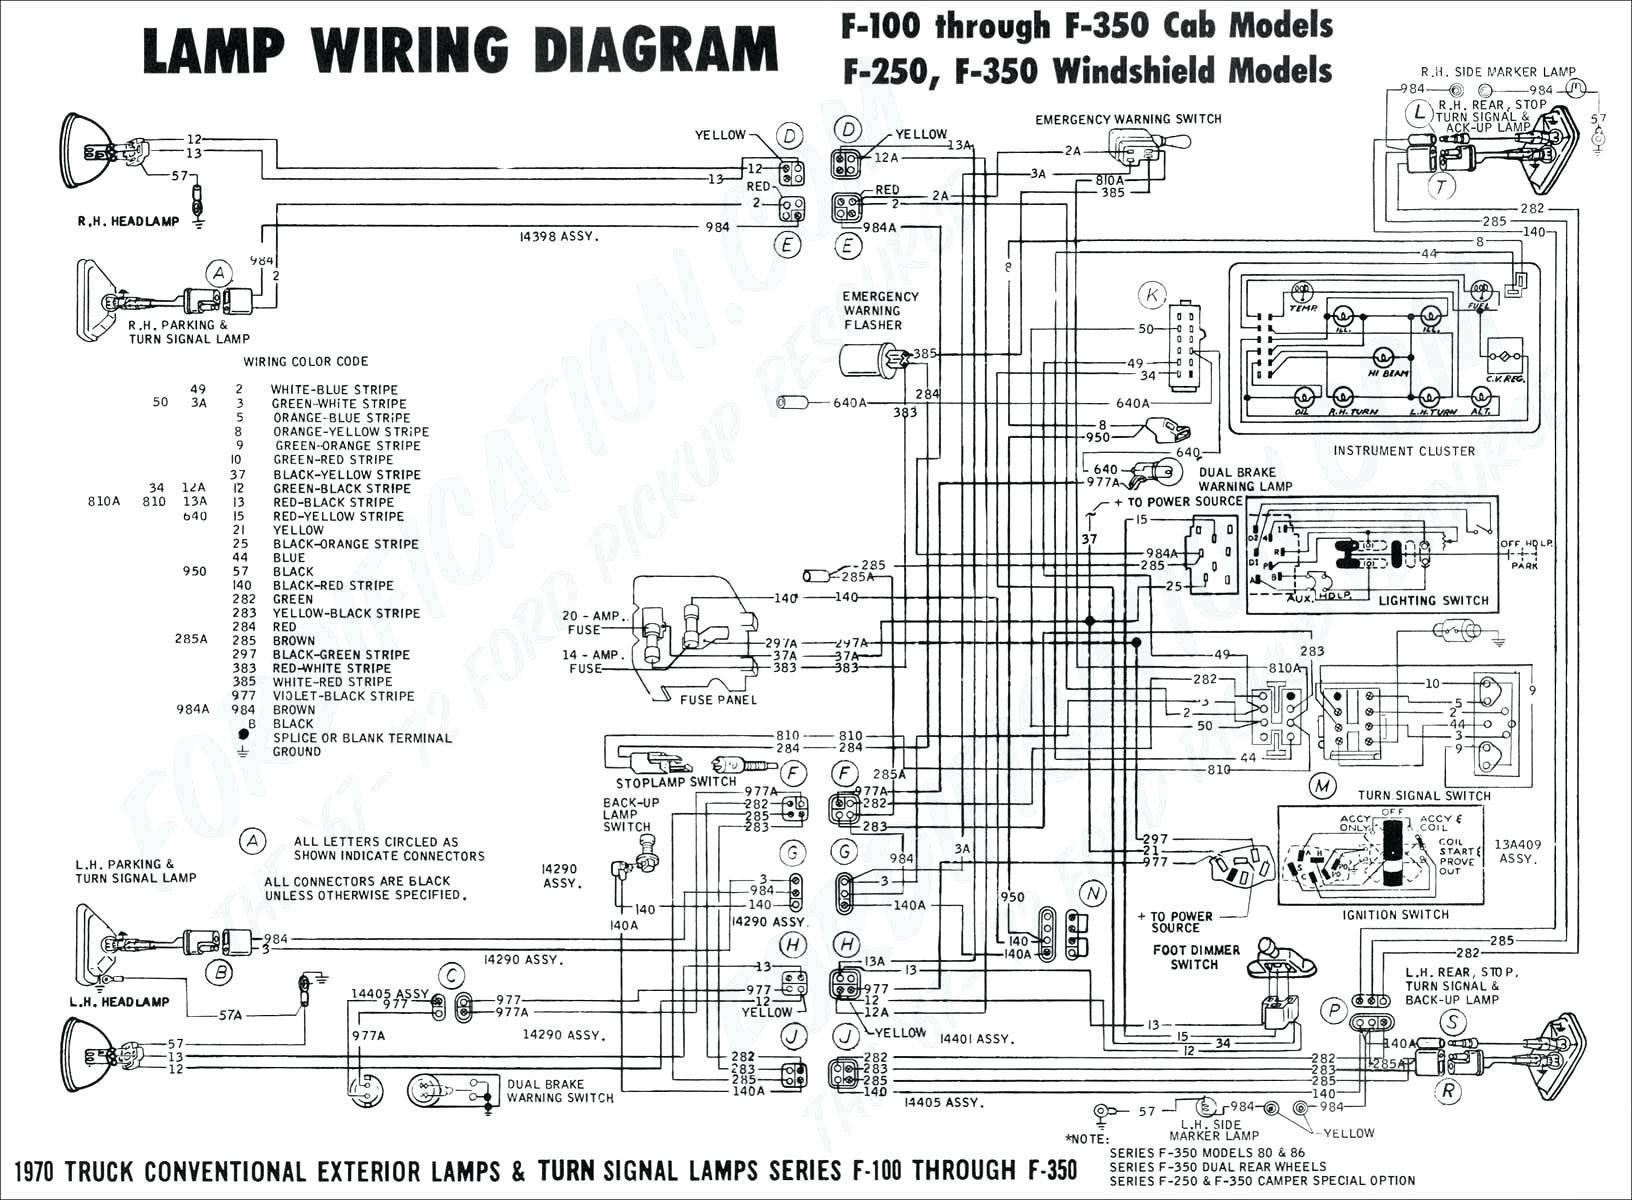 1996 Nissan Maxima Engine Diagram 2000 Nissan Maxima Fuse Diagram Of 1996 Nissan Maxima Engine Diagram